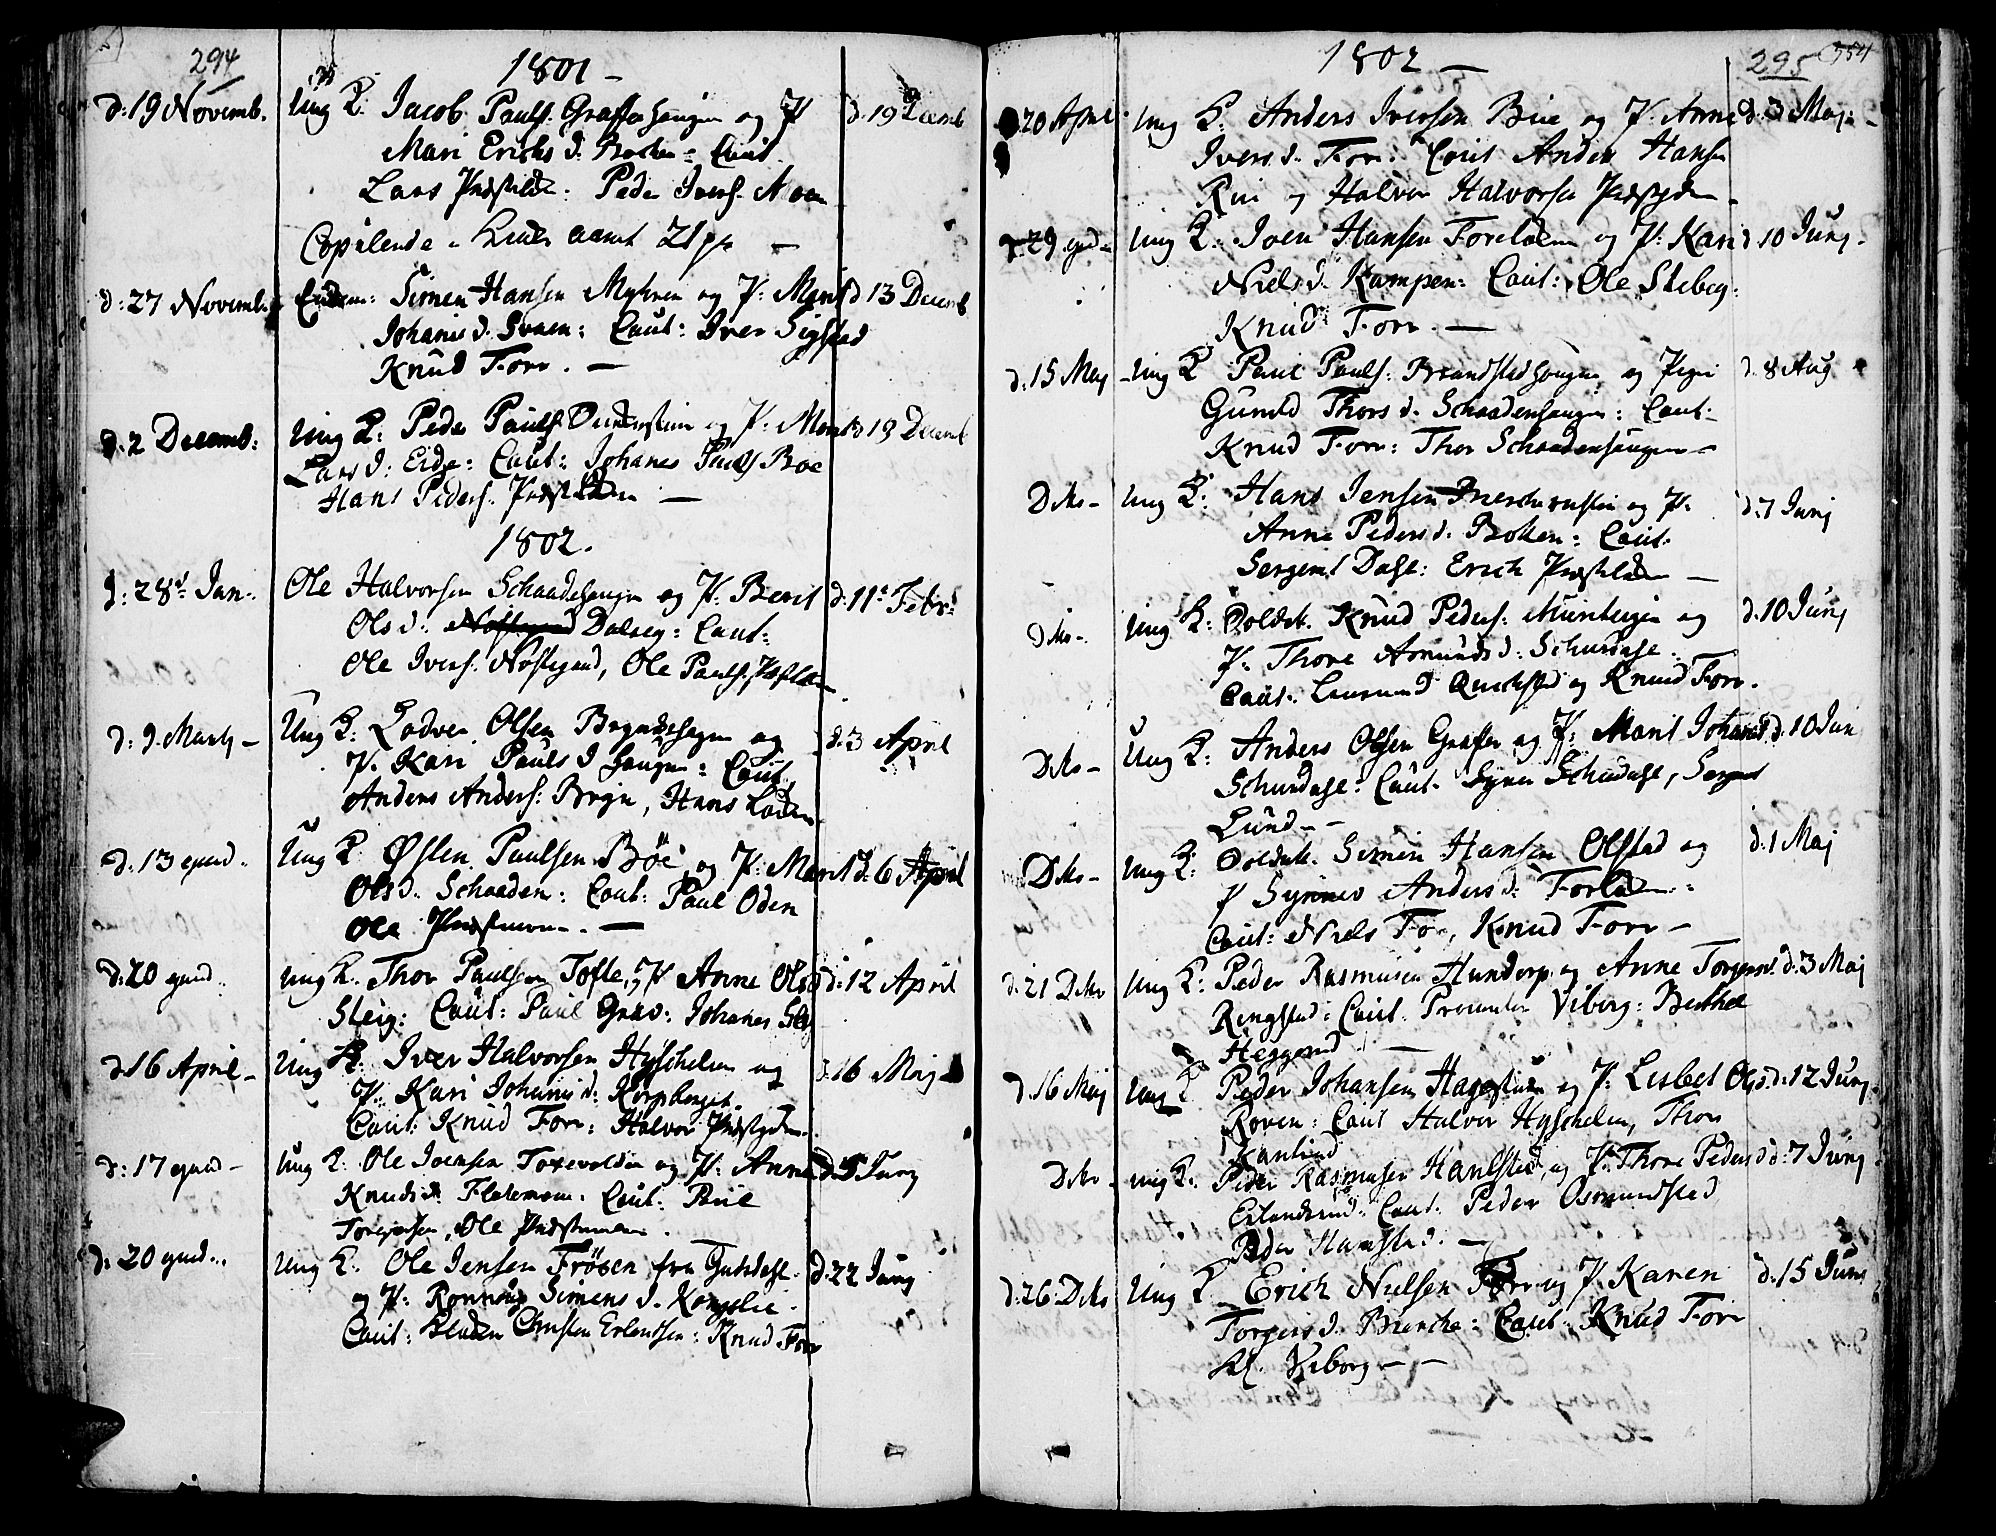 SAH, Fron prestekontor, H/Ha/Haa/L0001: Ministerialbok nr. 1, 1799-1816, s. 294-295